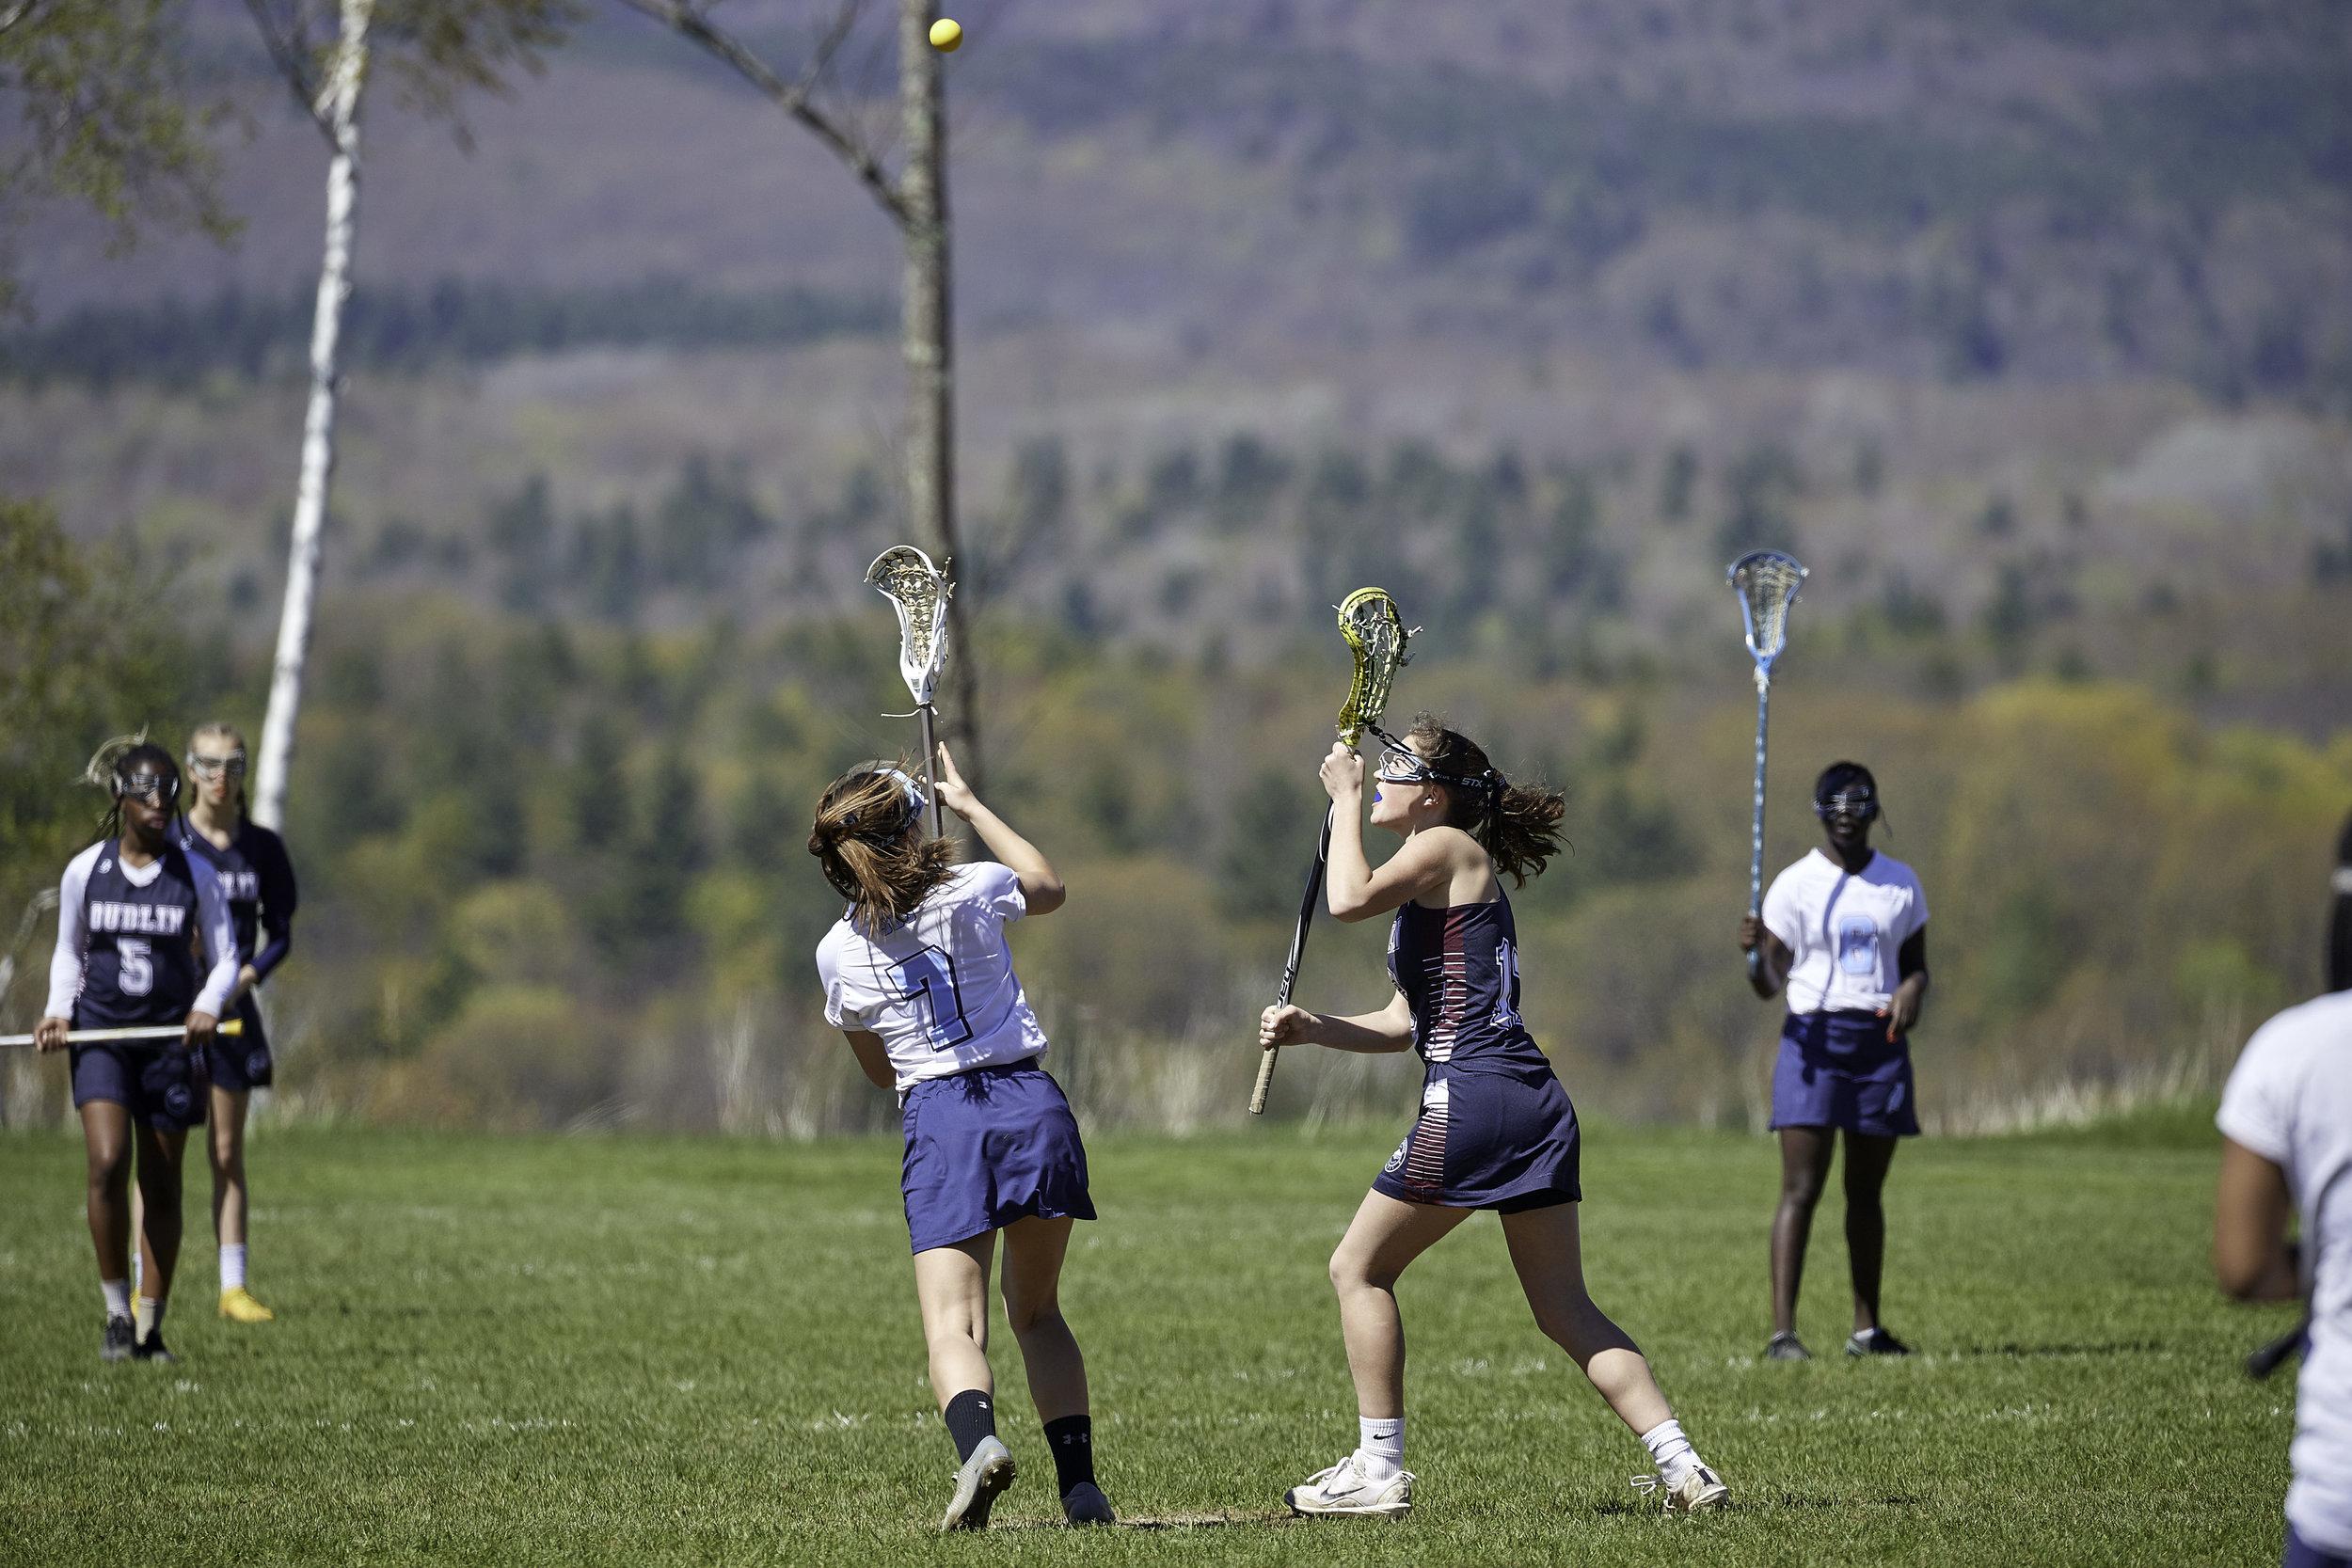 Girls Lacrosse vs. Stoneleigh Burnham School - May 11, 2019 - May 10, 2019193334.jpg